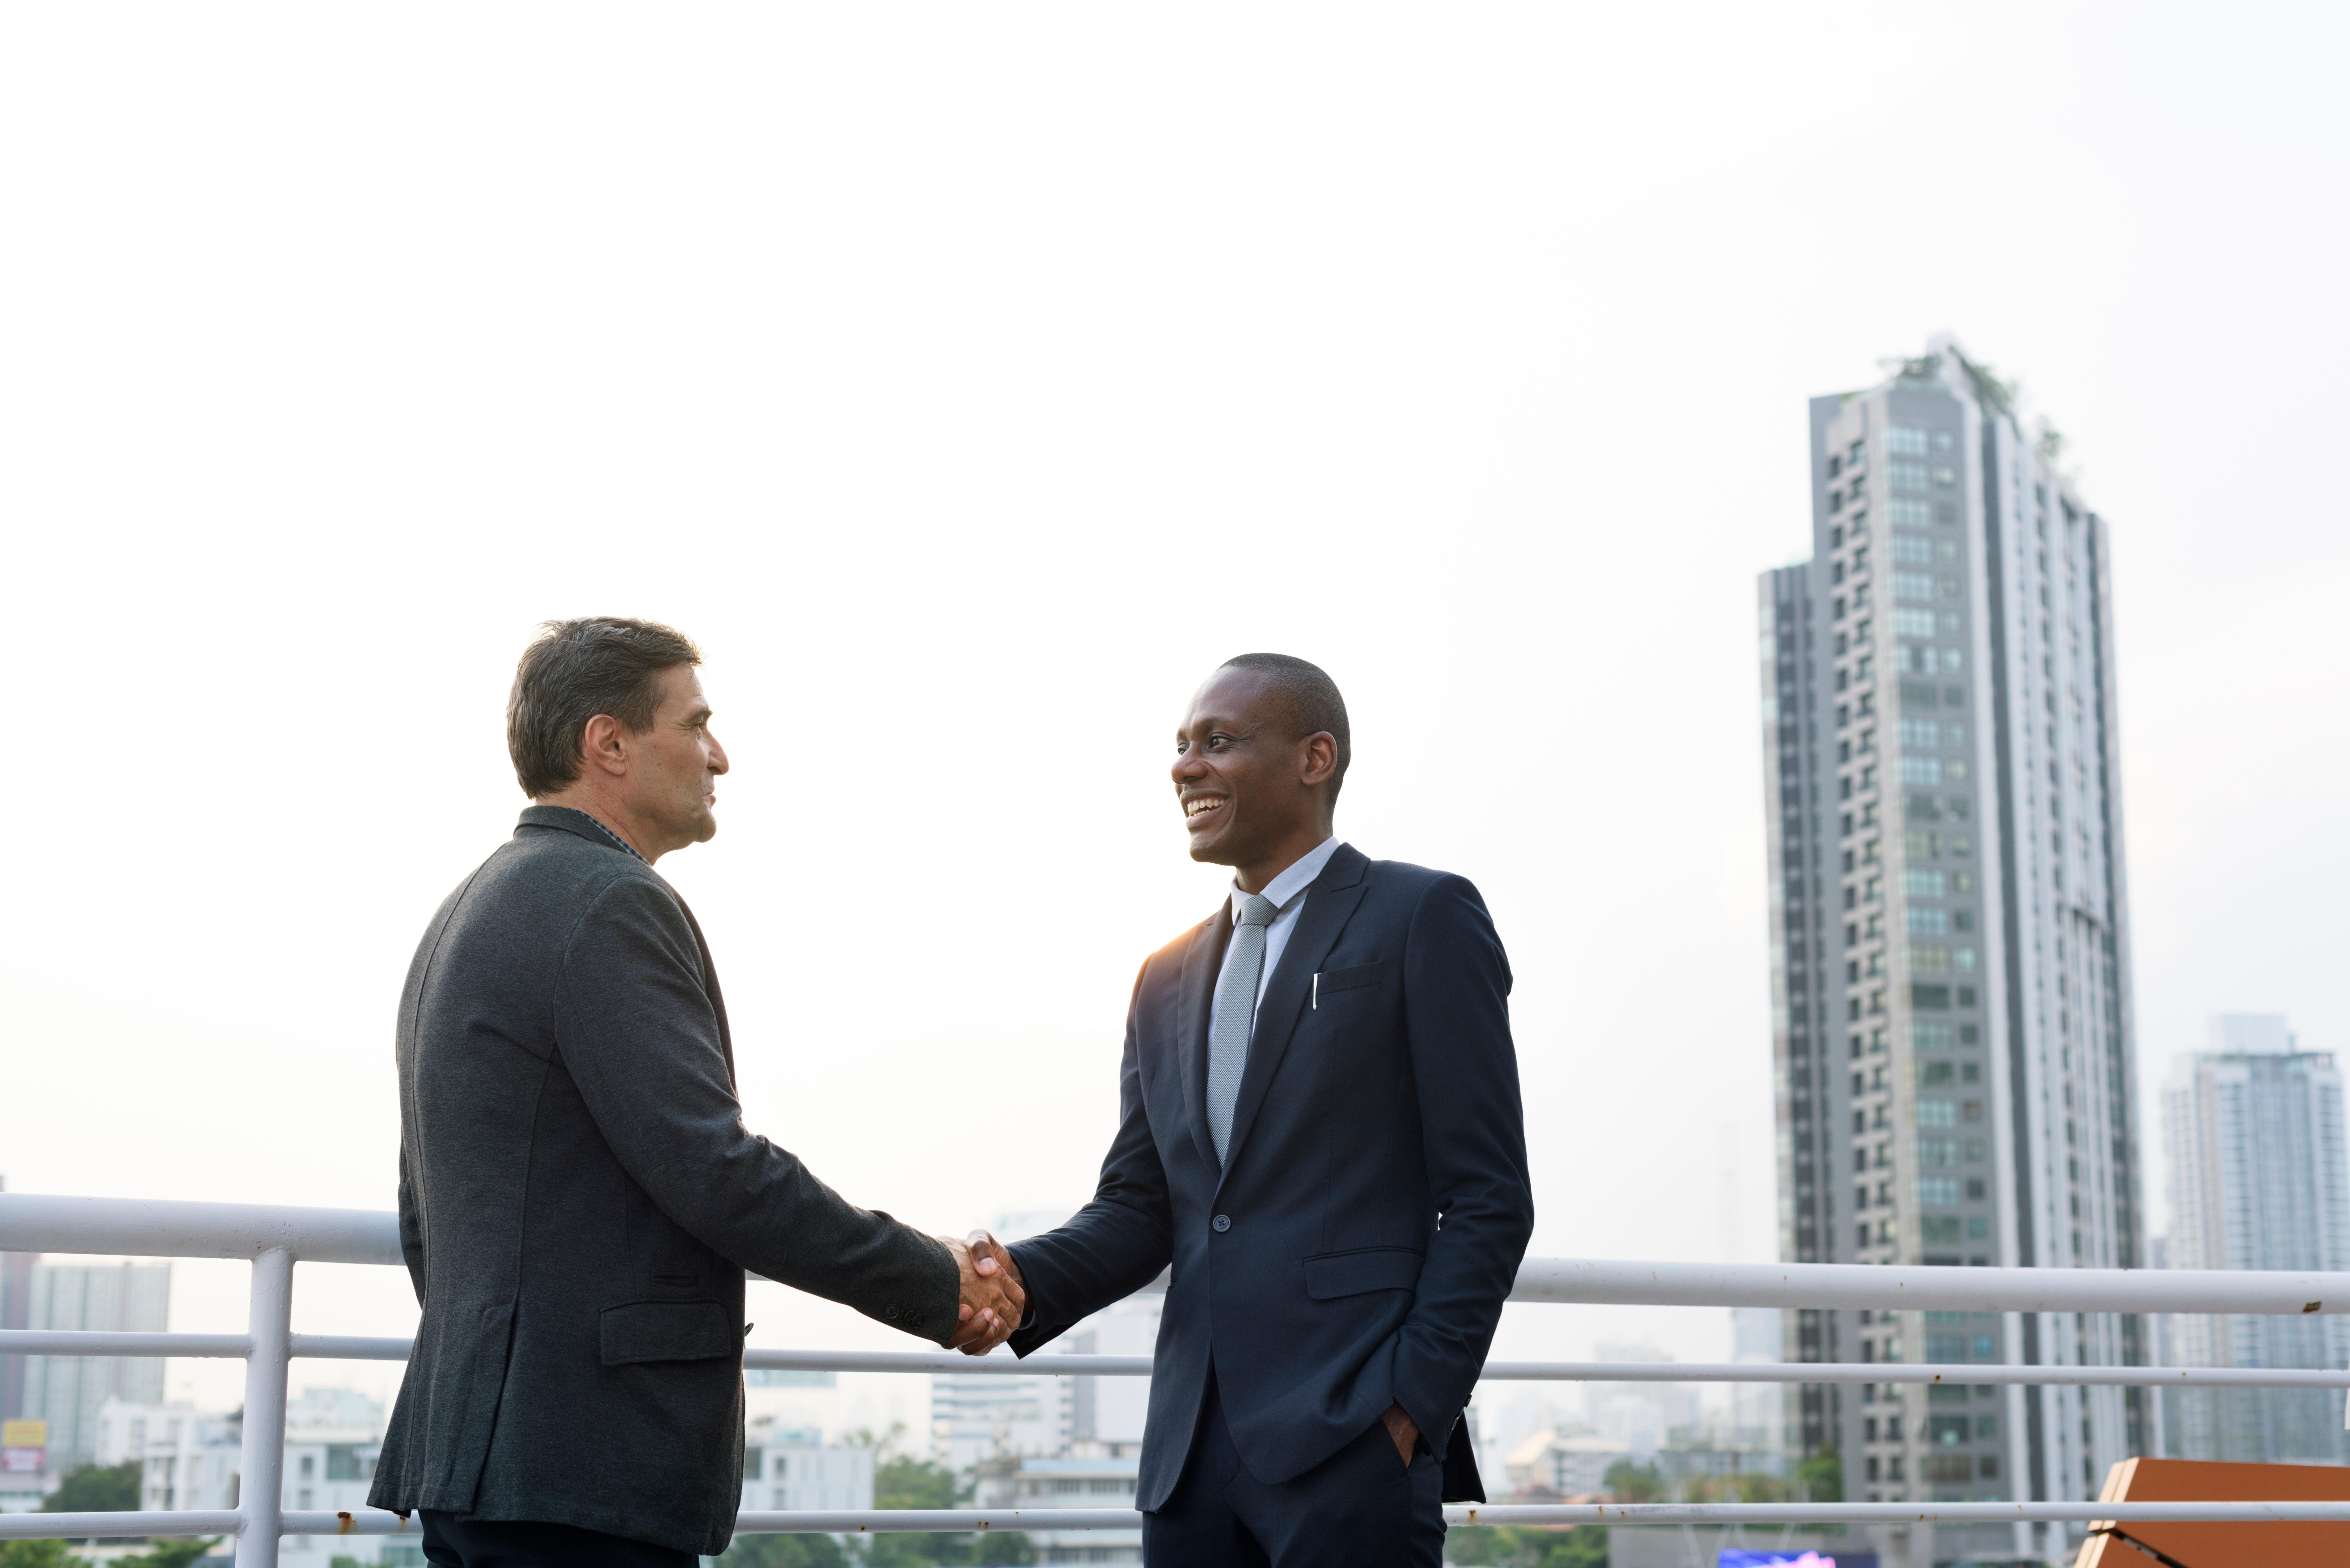 business-discussion-talking-deal-concept-P68PUGJ